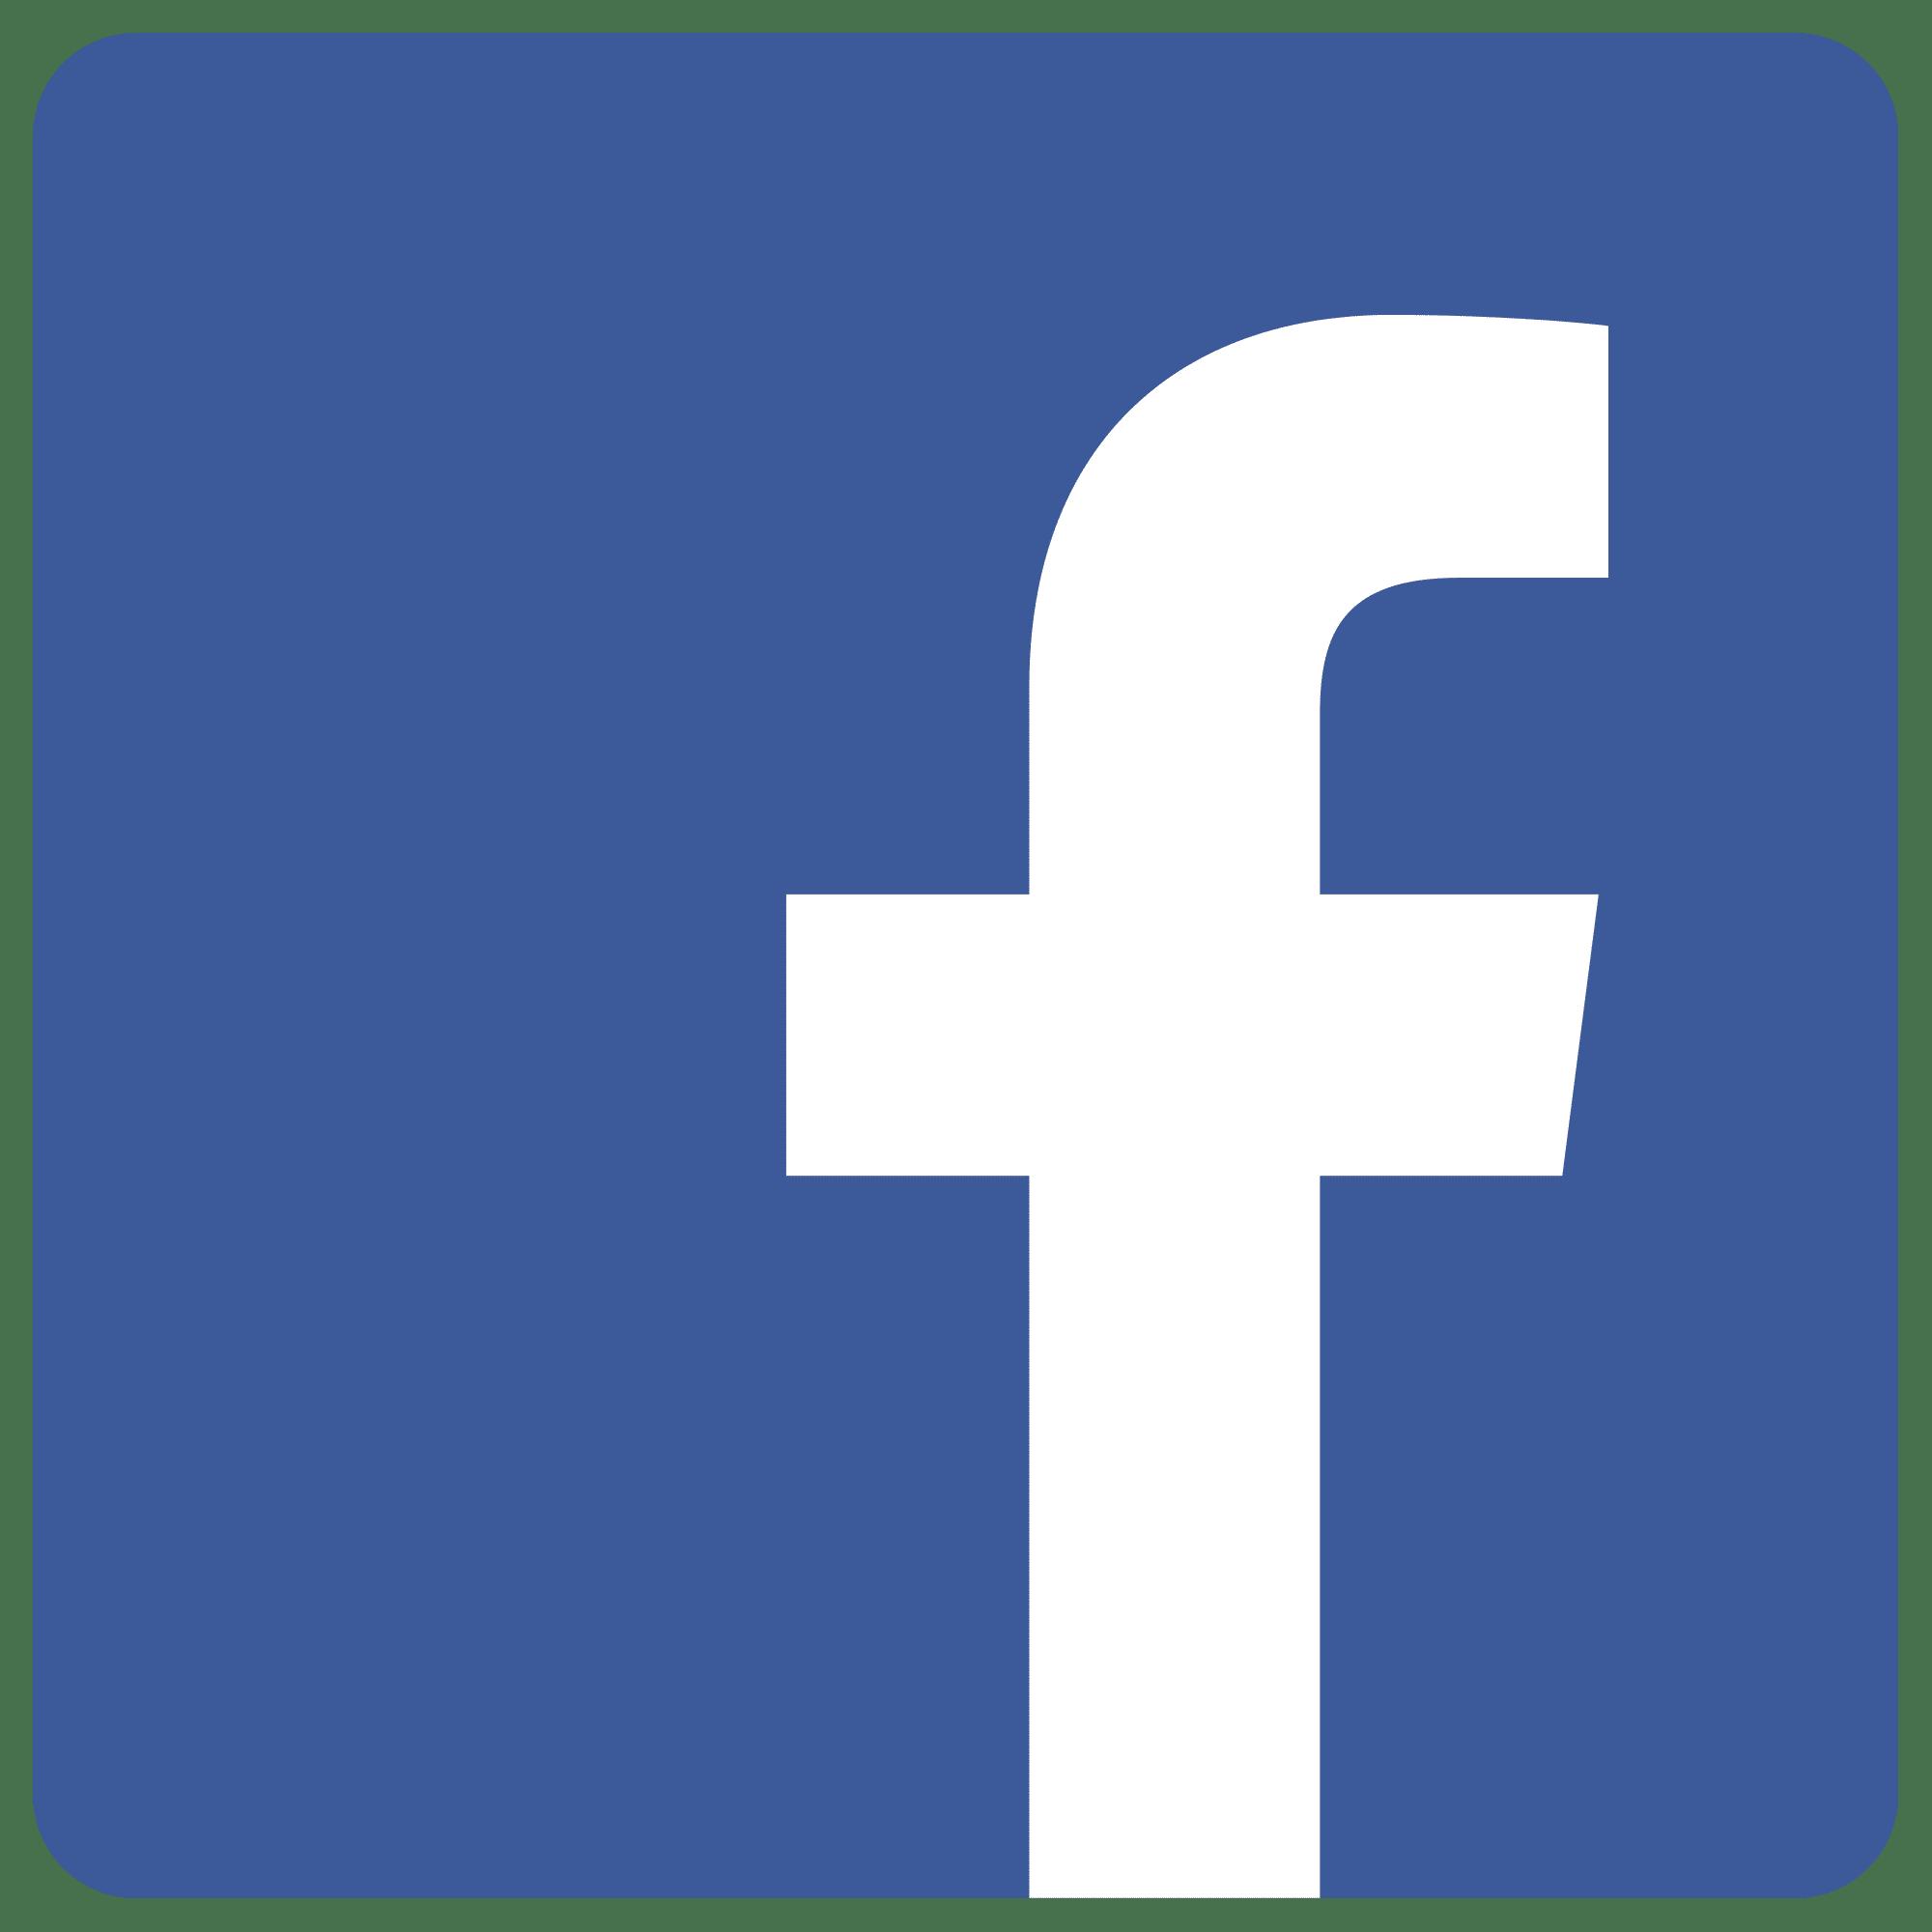 facebook icon transparent background 3